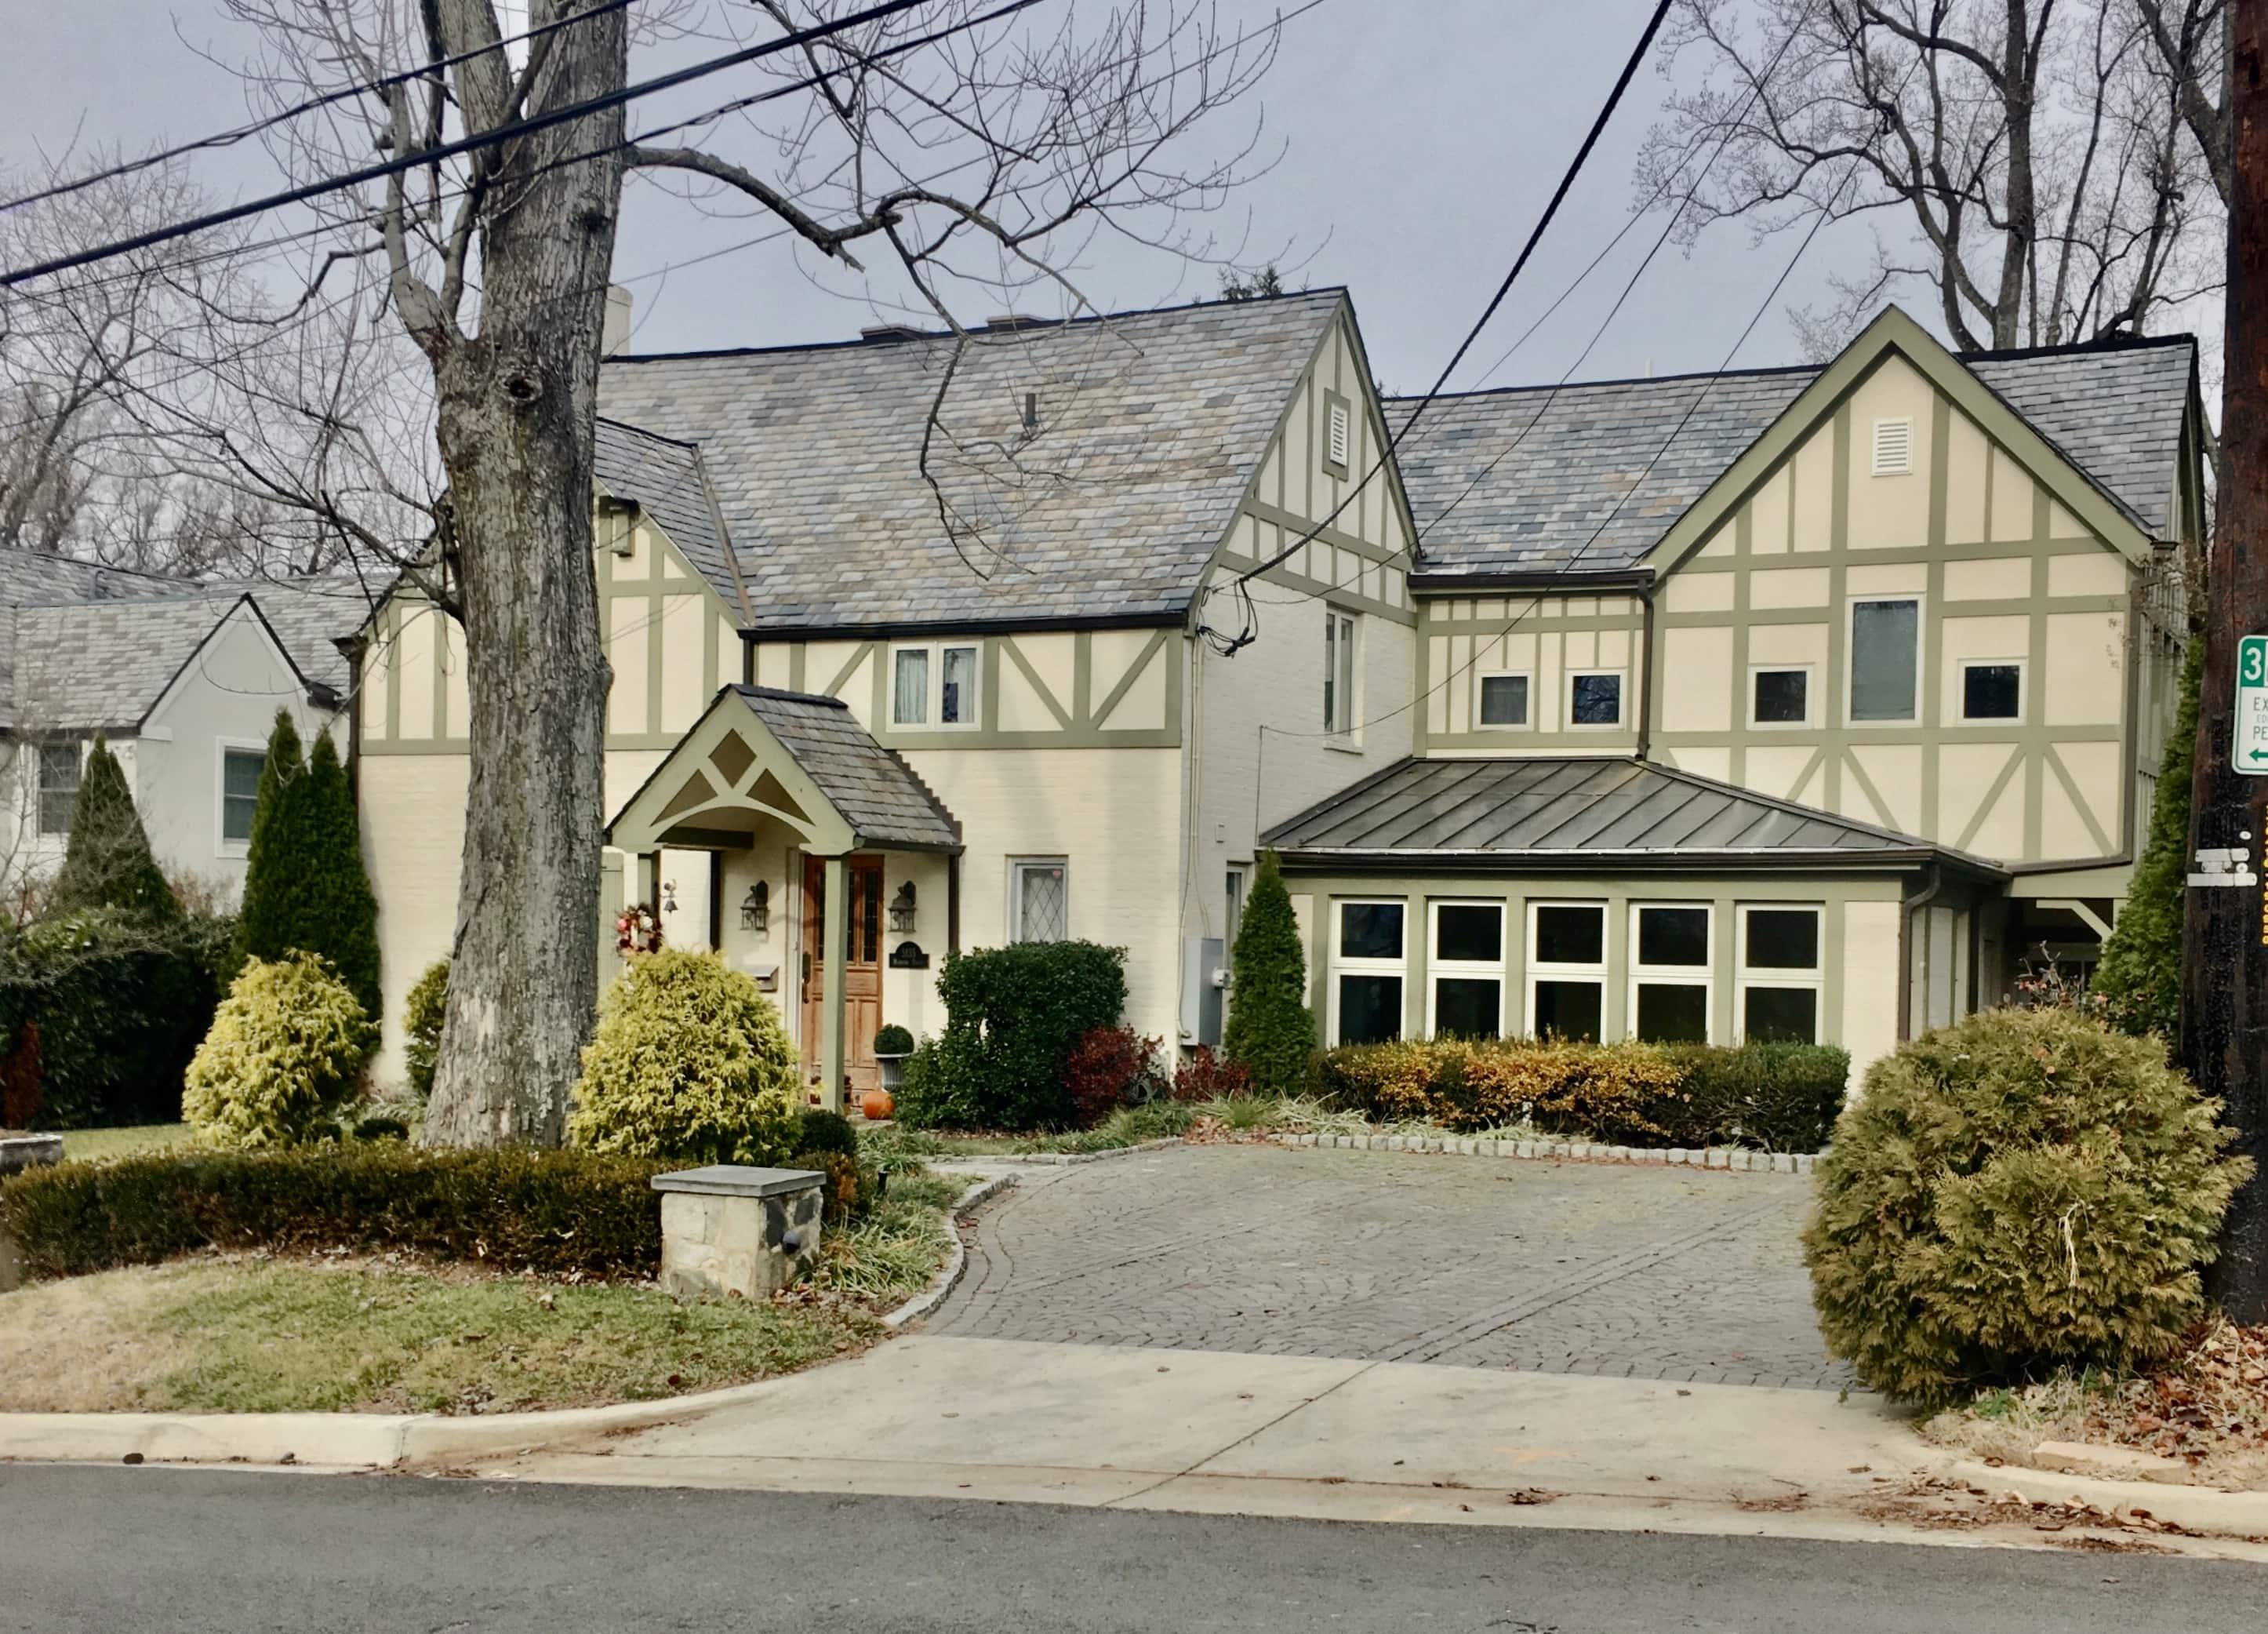 Home in Edgemoor - Bethesda MD